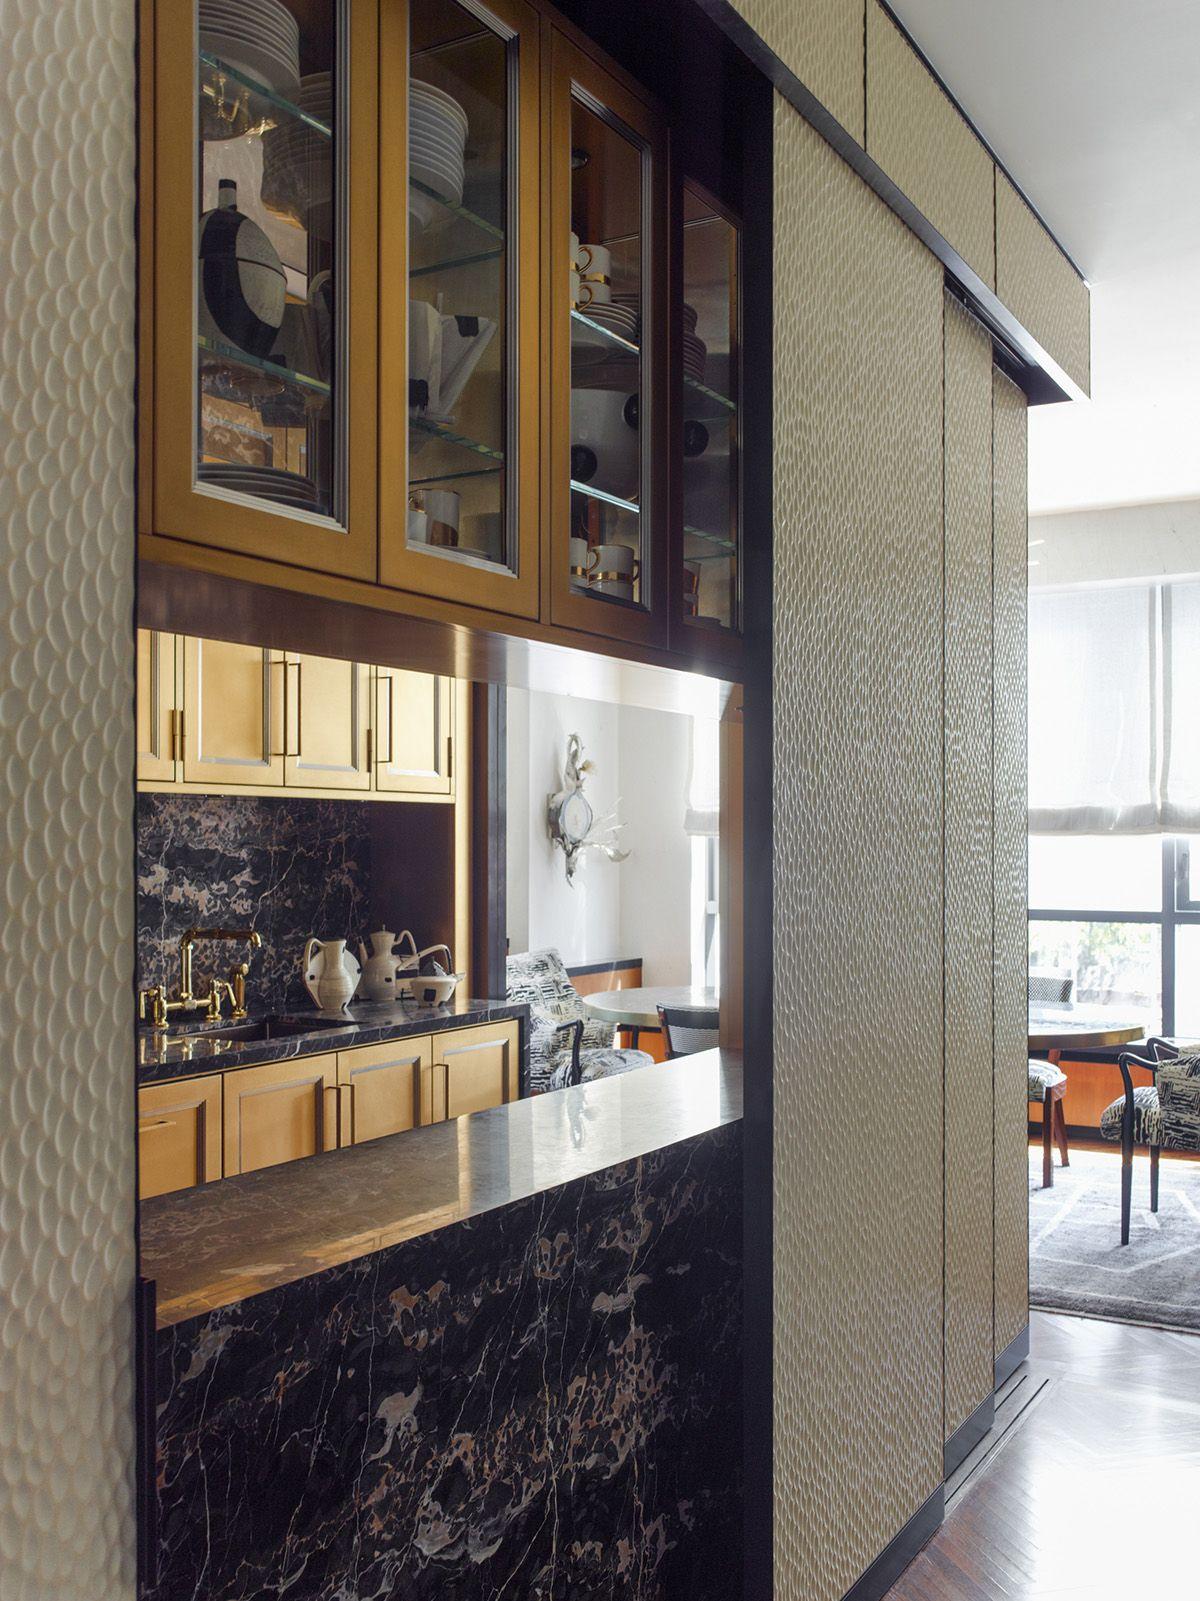 KELLY WEARSTLER | INTERIORS. Sliding Doors Reveal An Open Kitchen/bar  Entertaining Space.